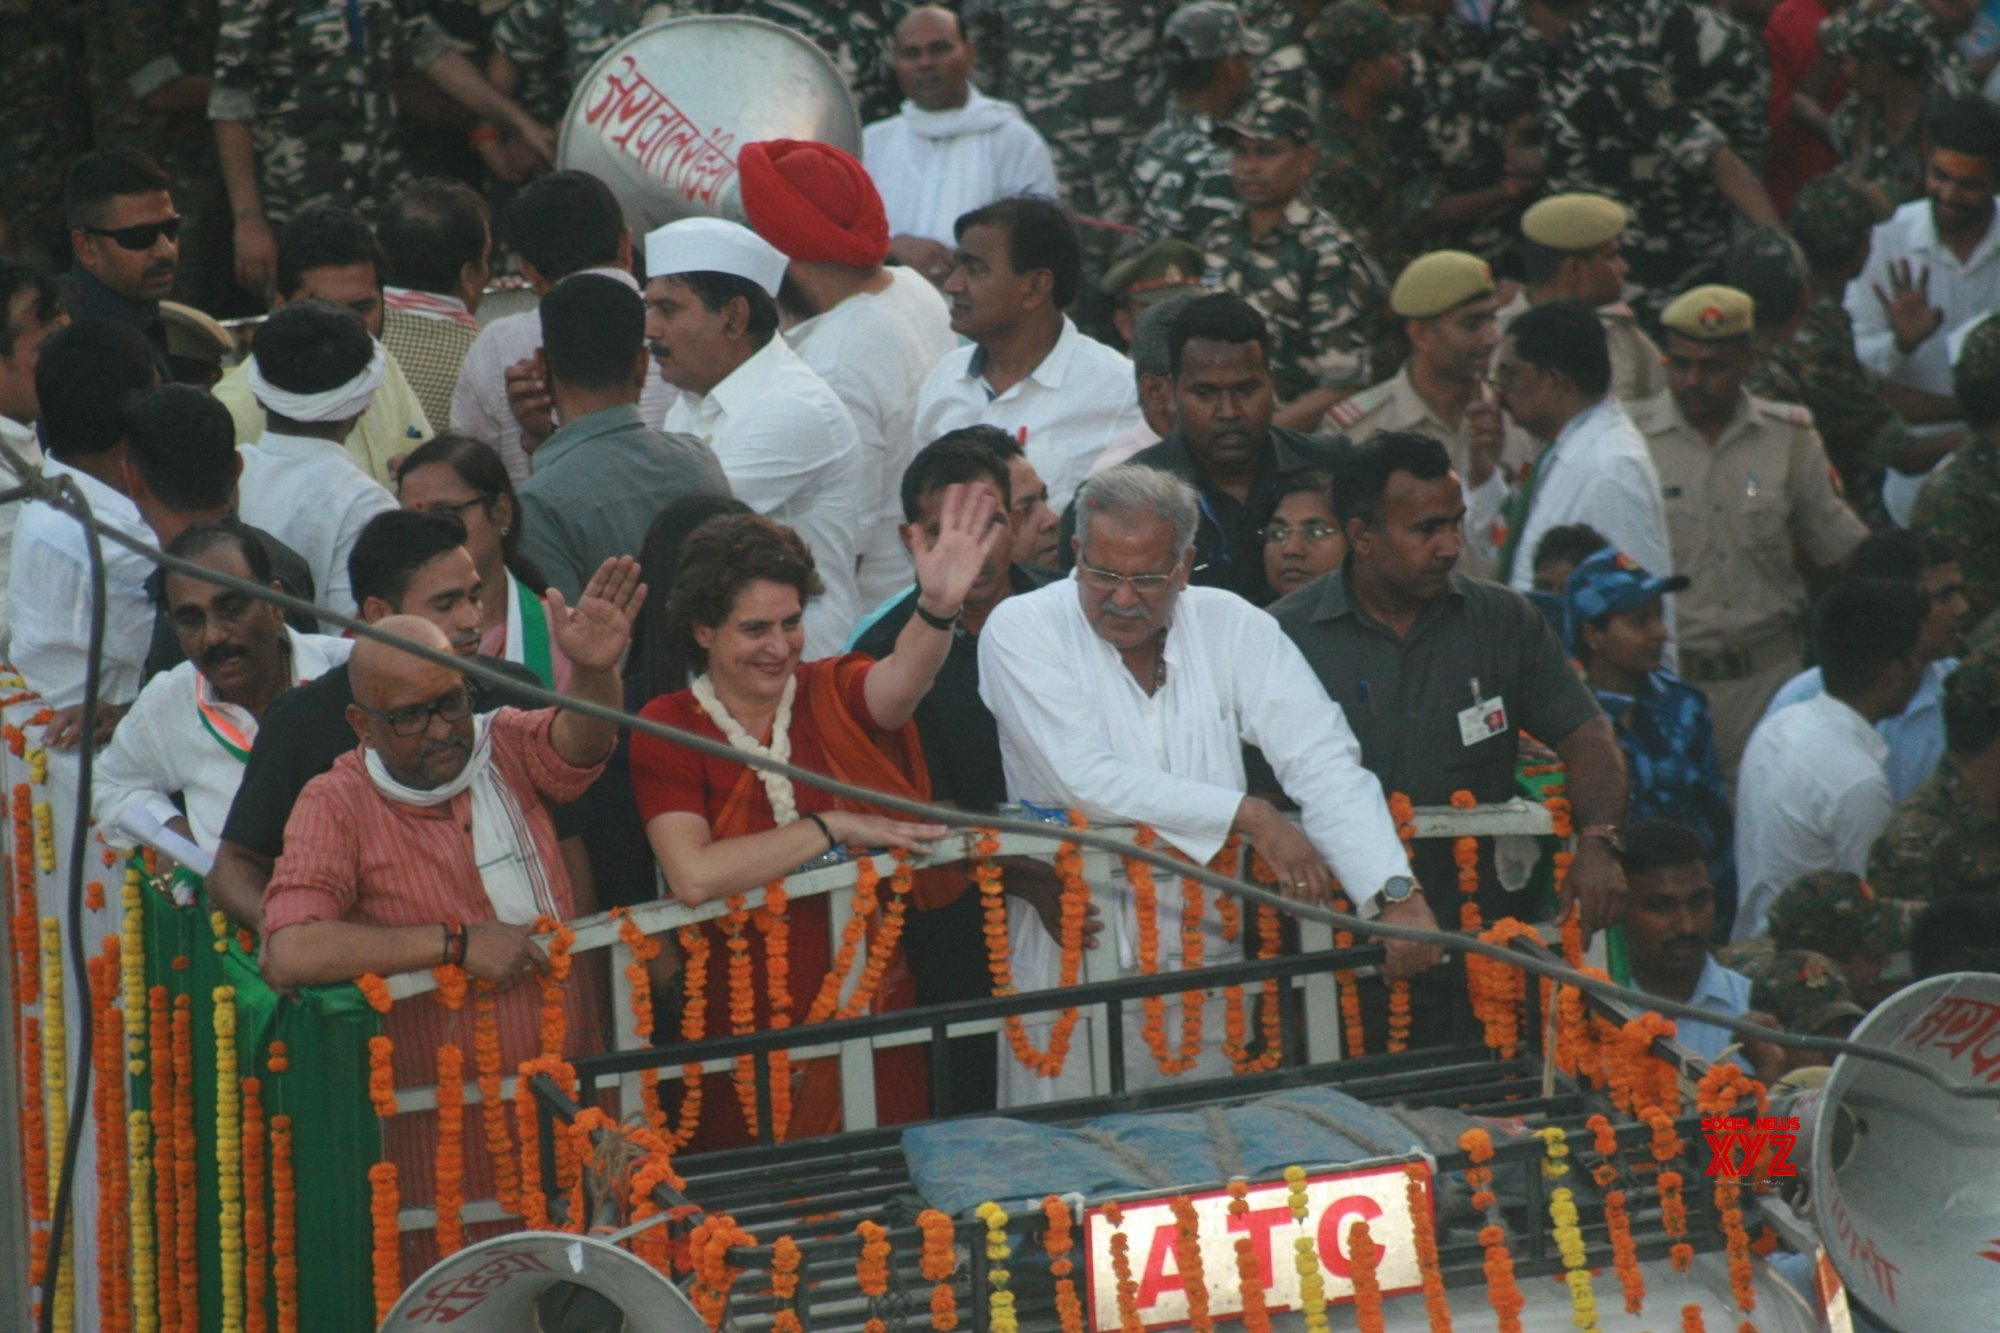 Priyanka steps down from roadshow to save man